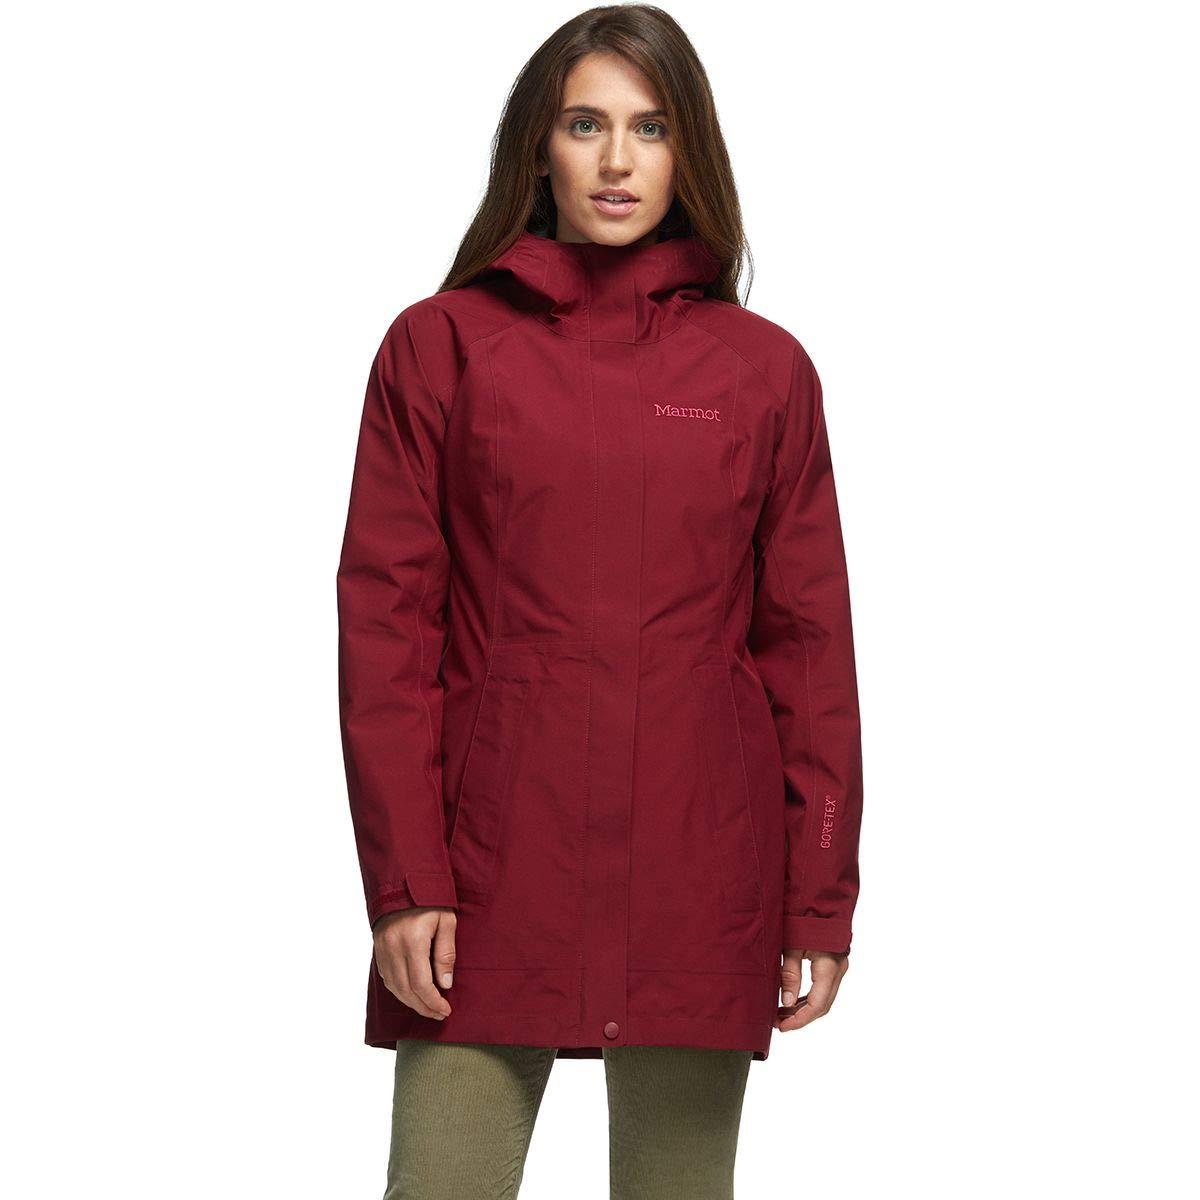 Marmot Womens Essential Jacket